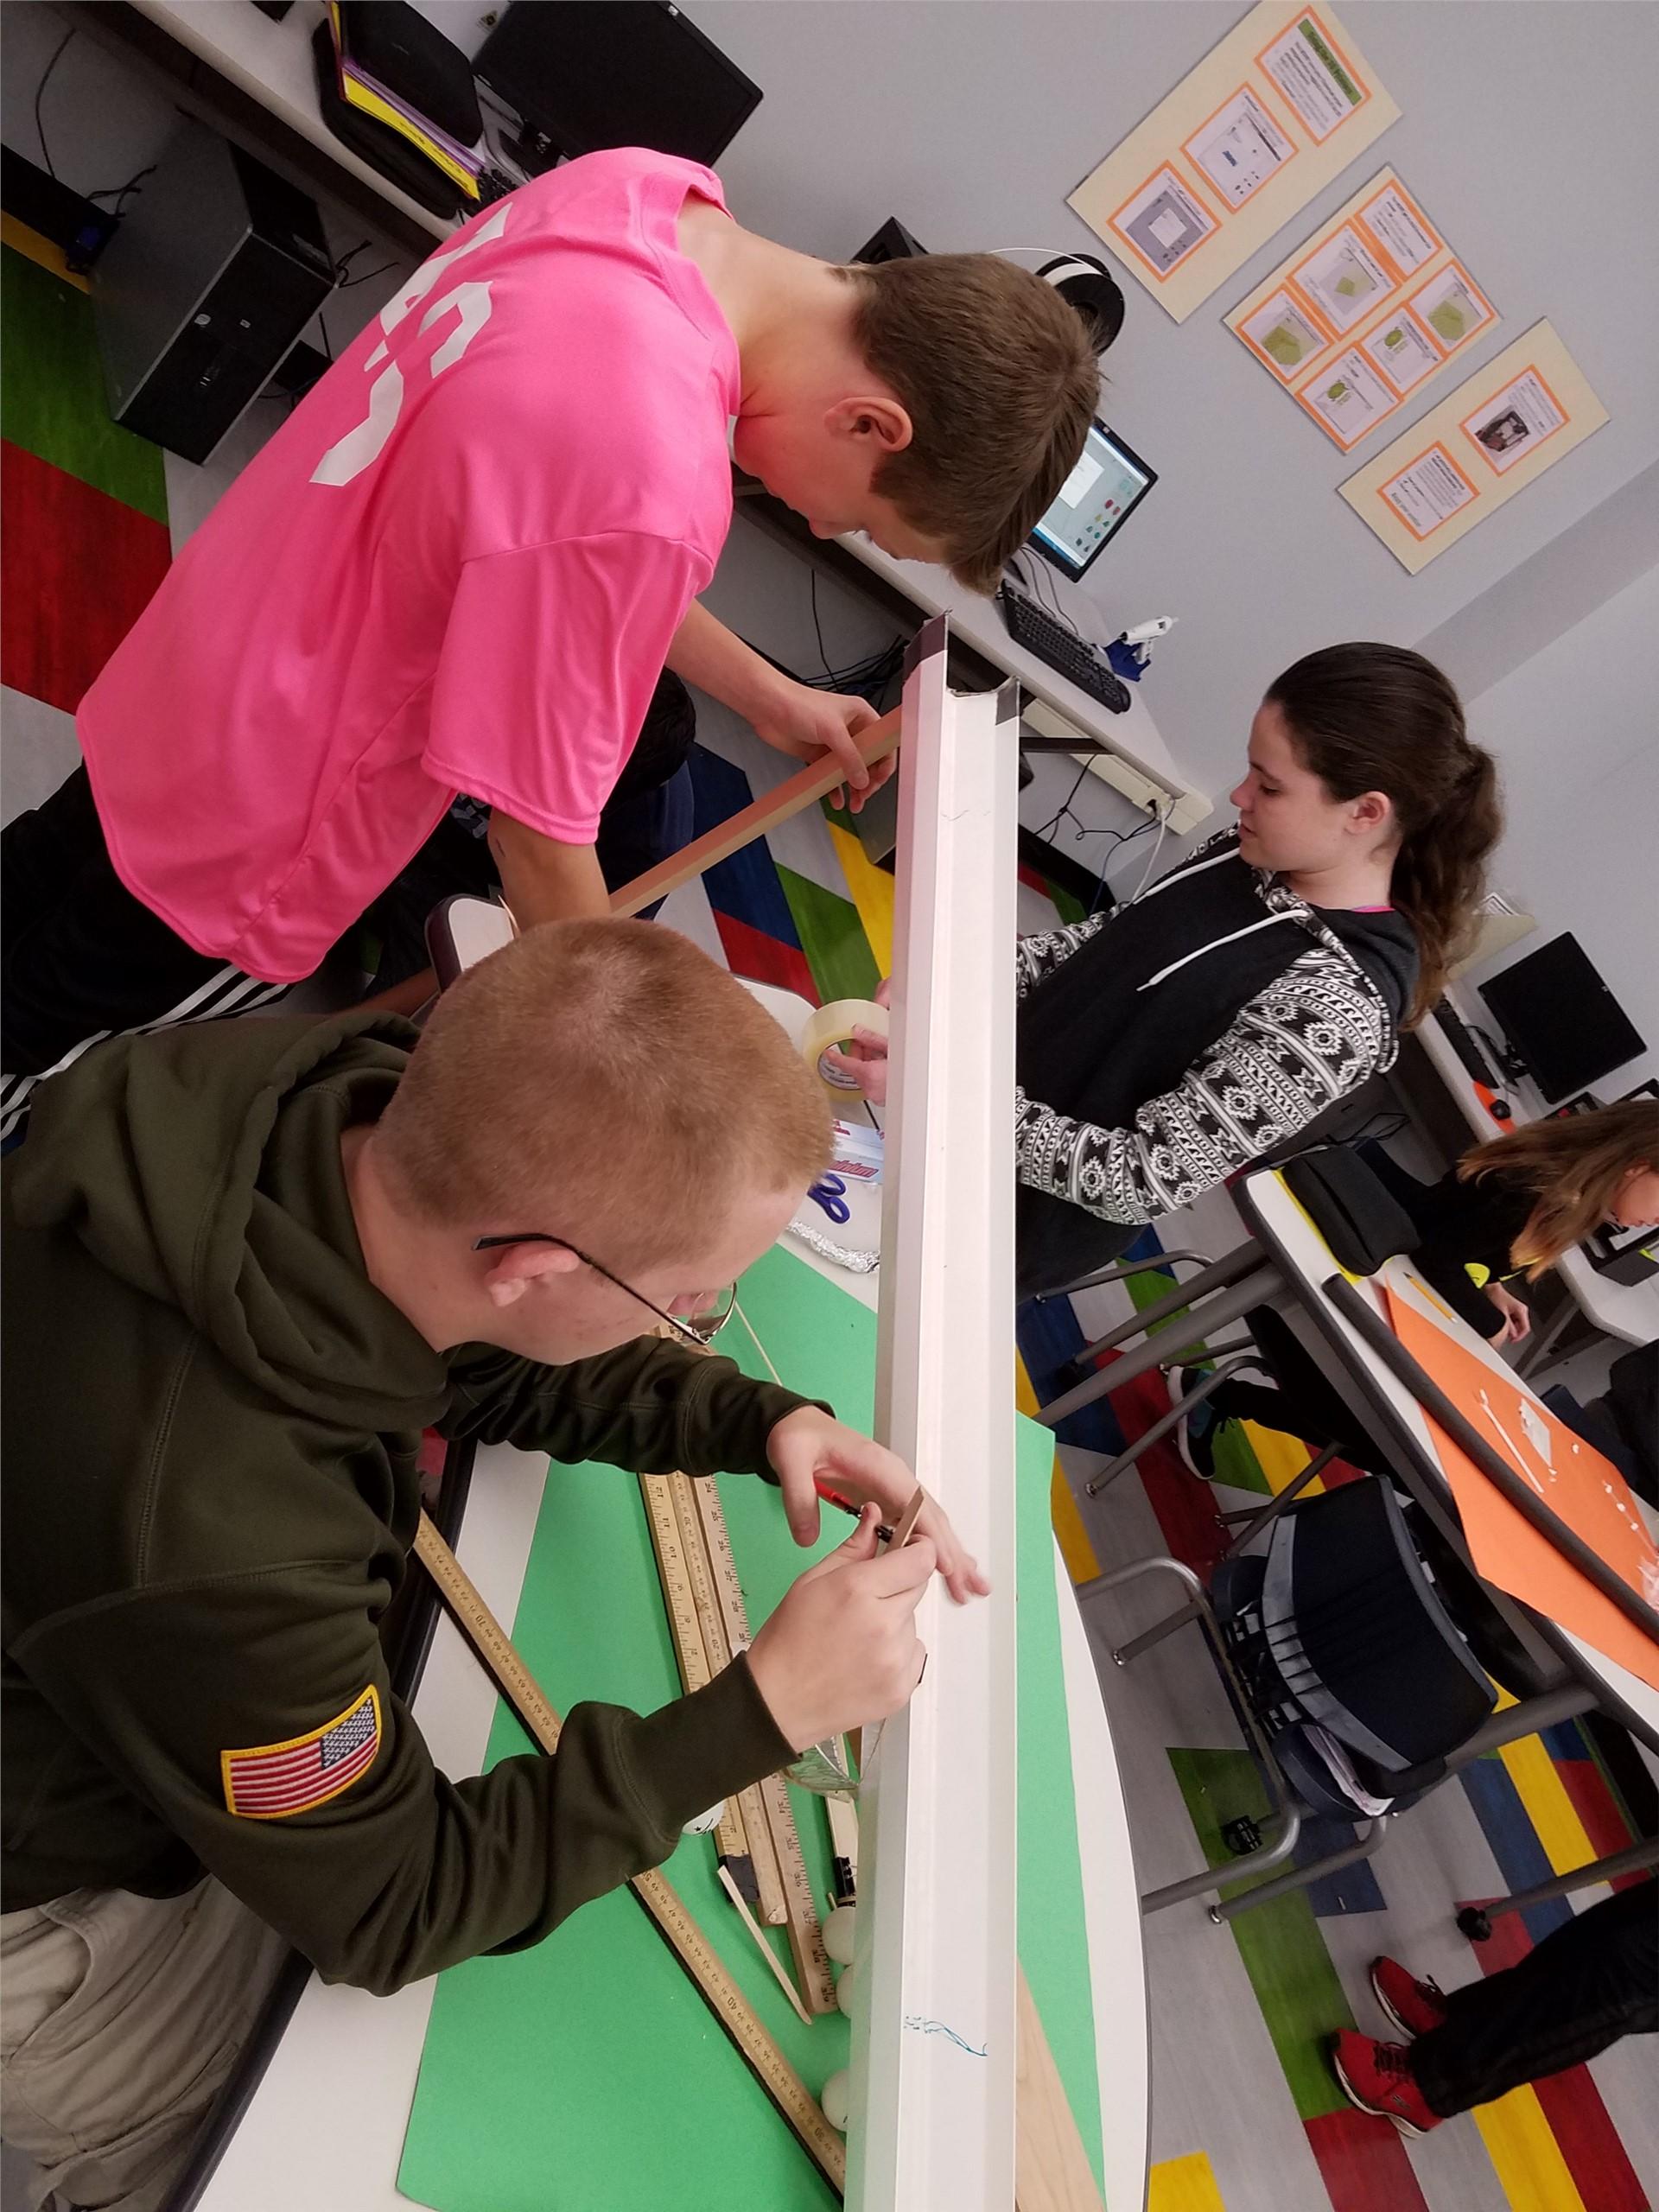 Rube Goldberg project construction